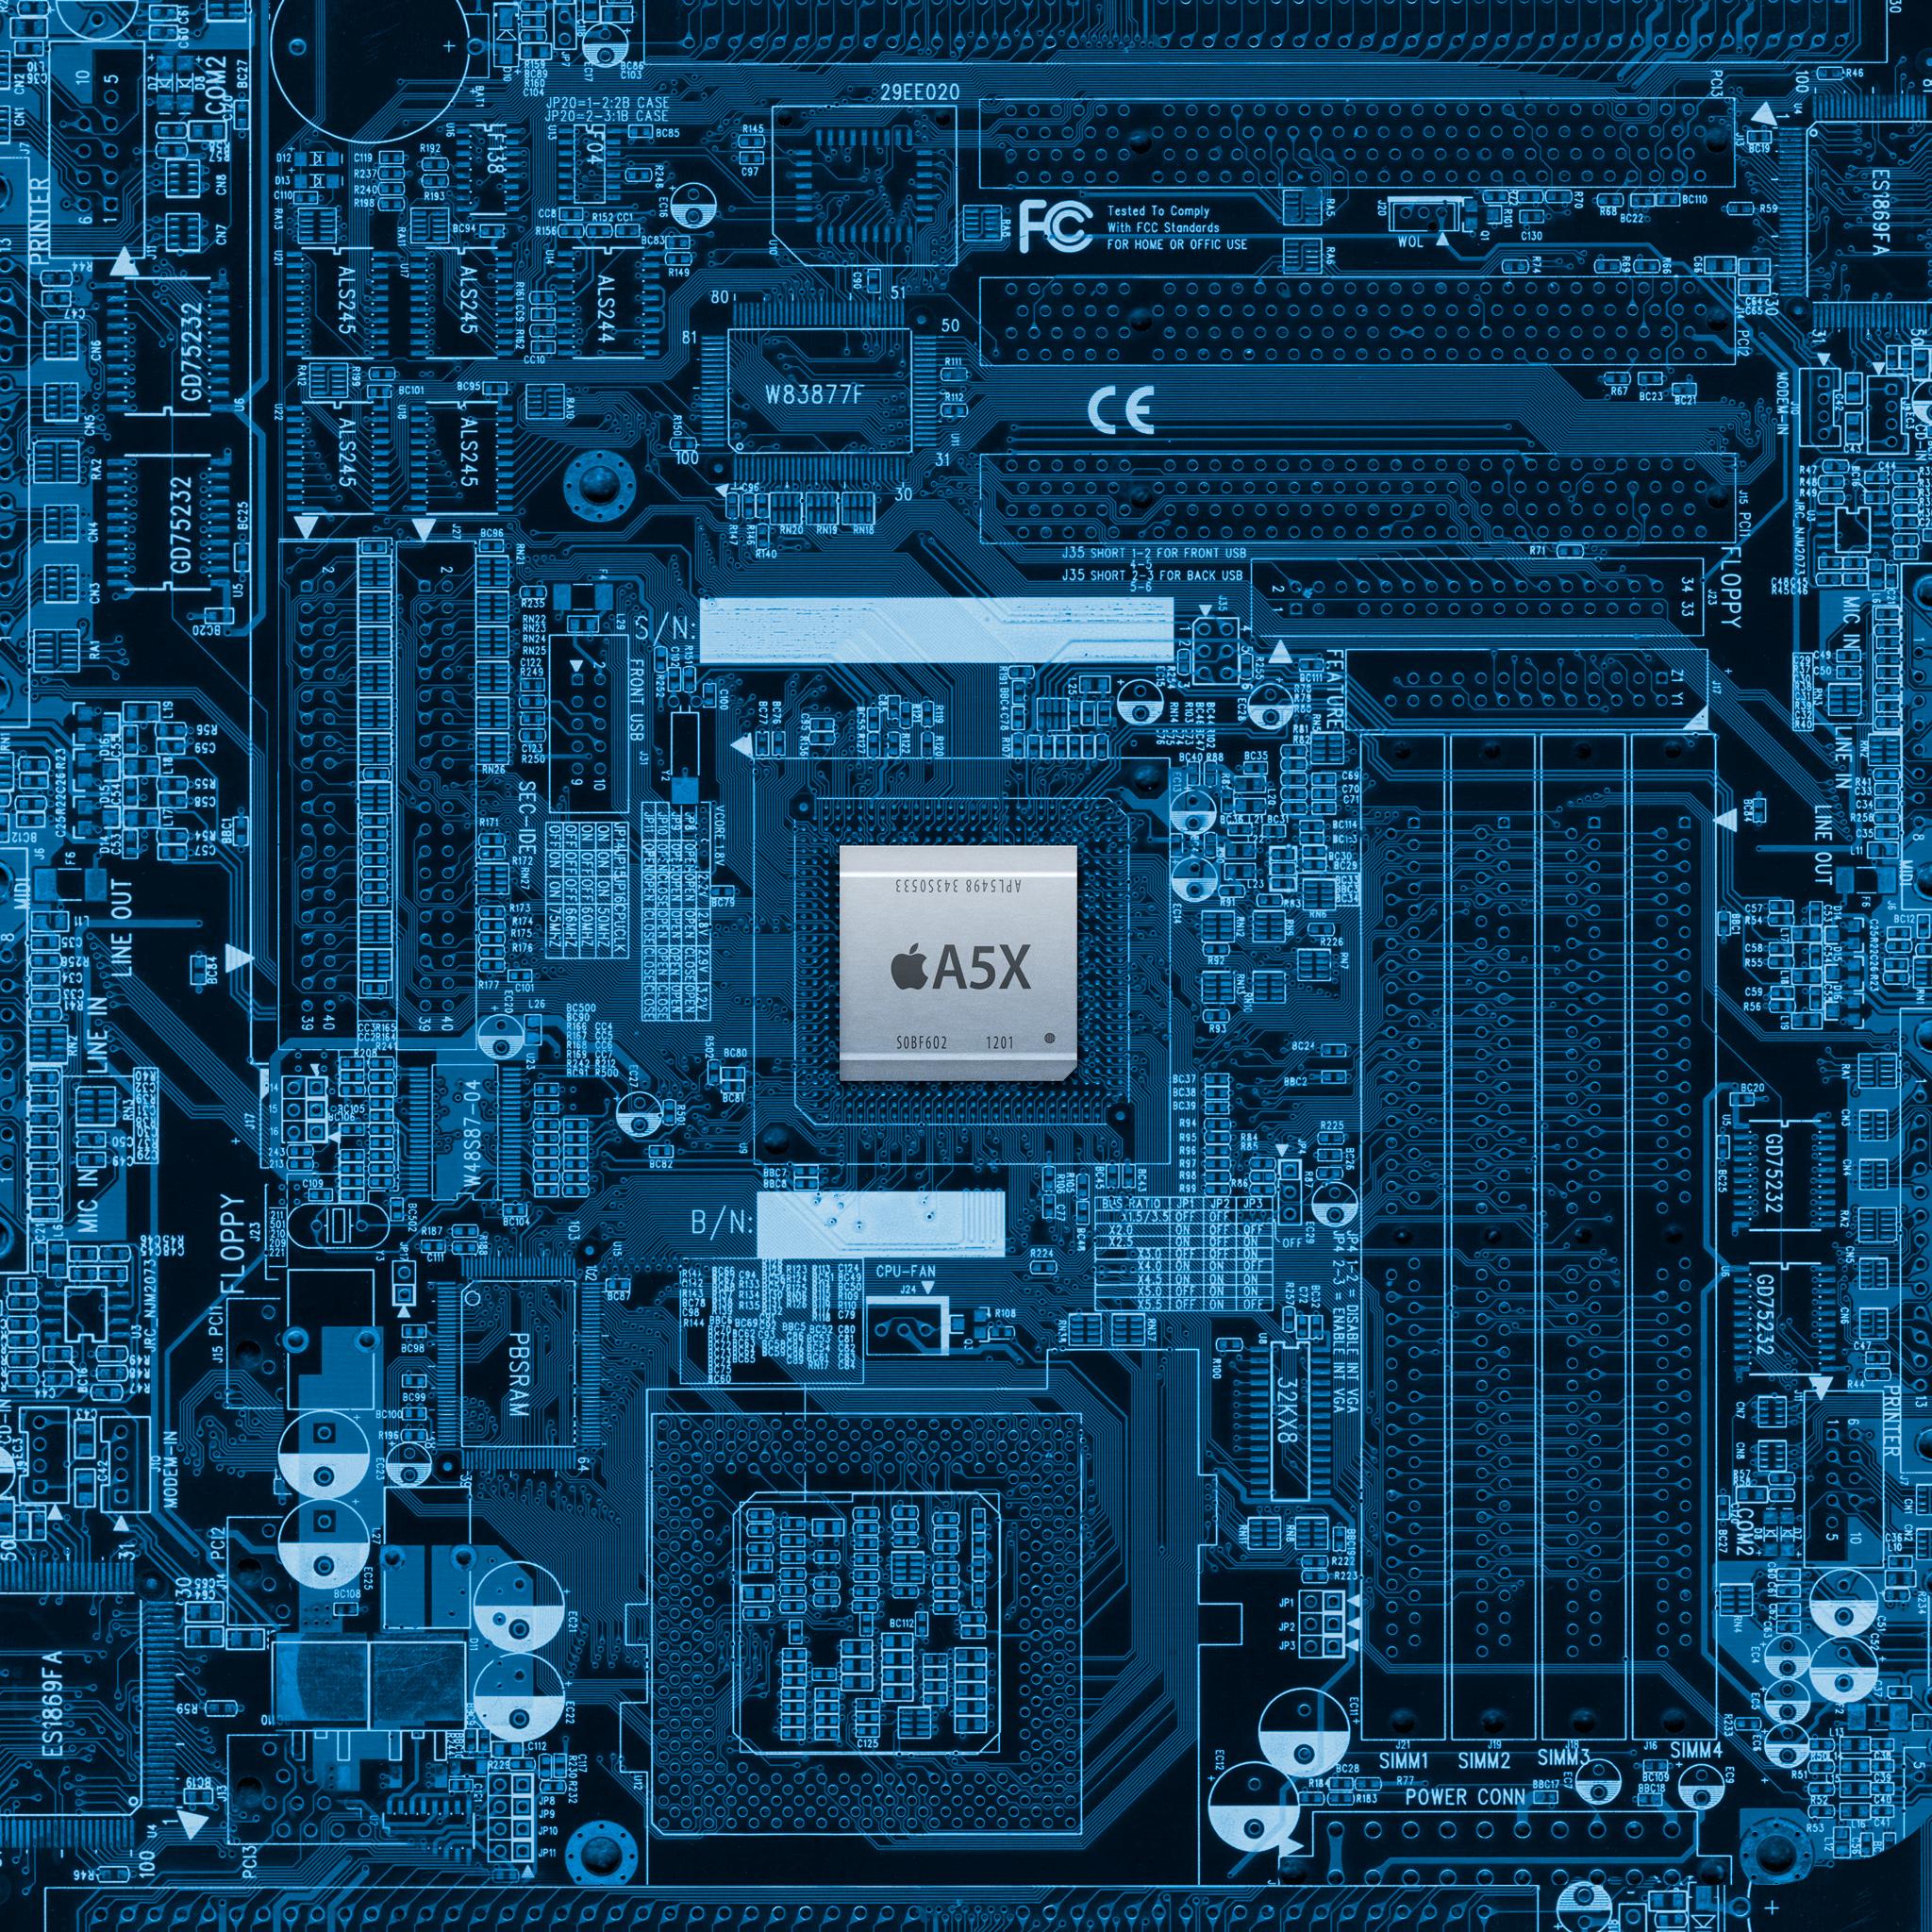 Apple-A5X-3Wallpapers-ipad-Retina